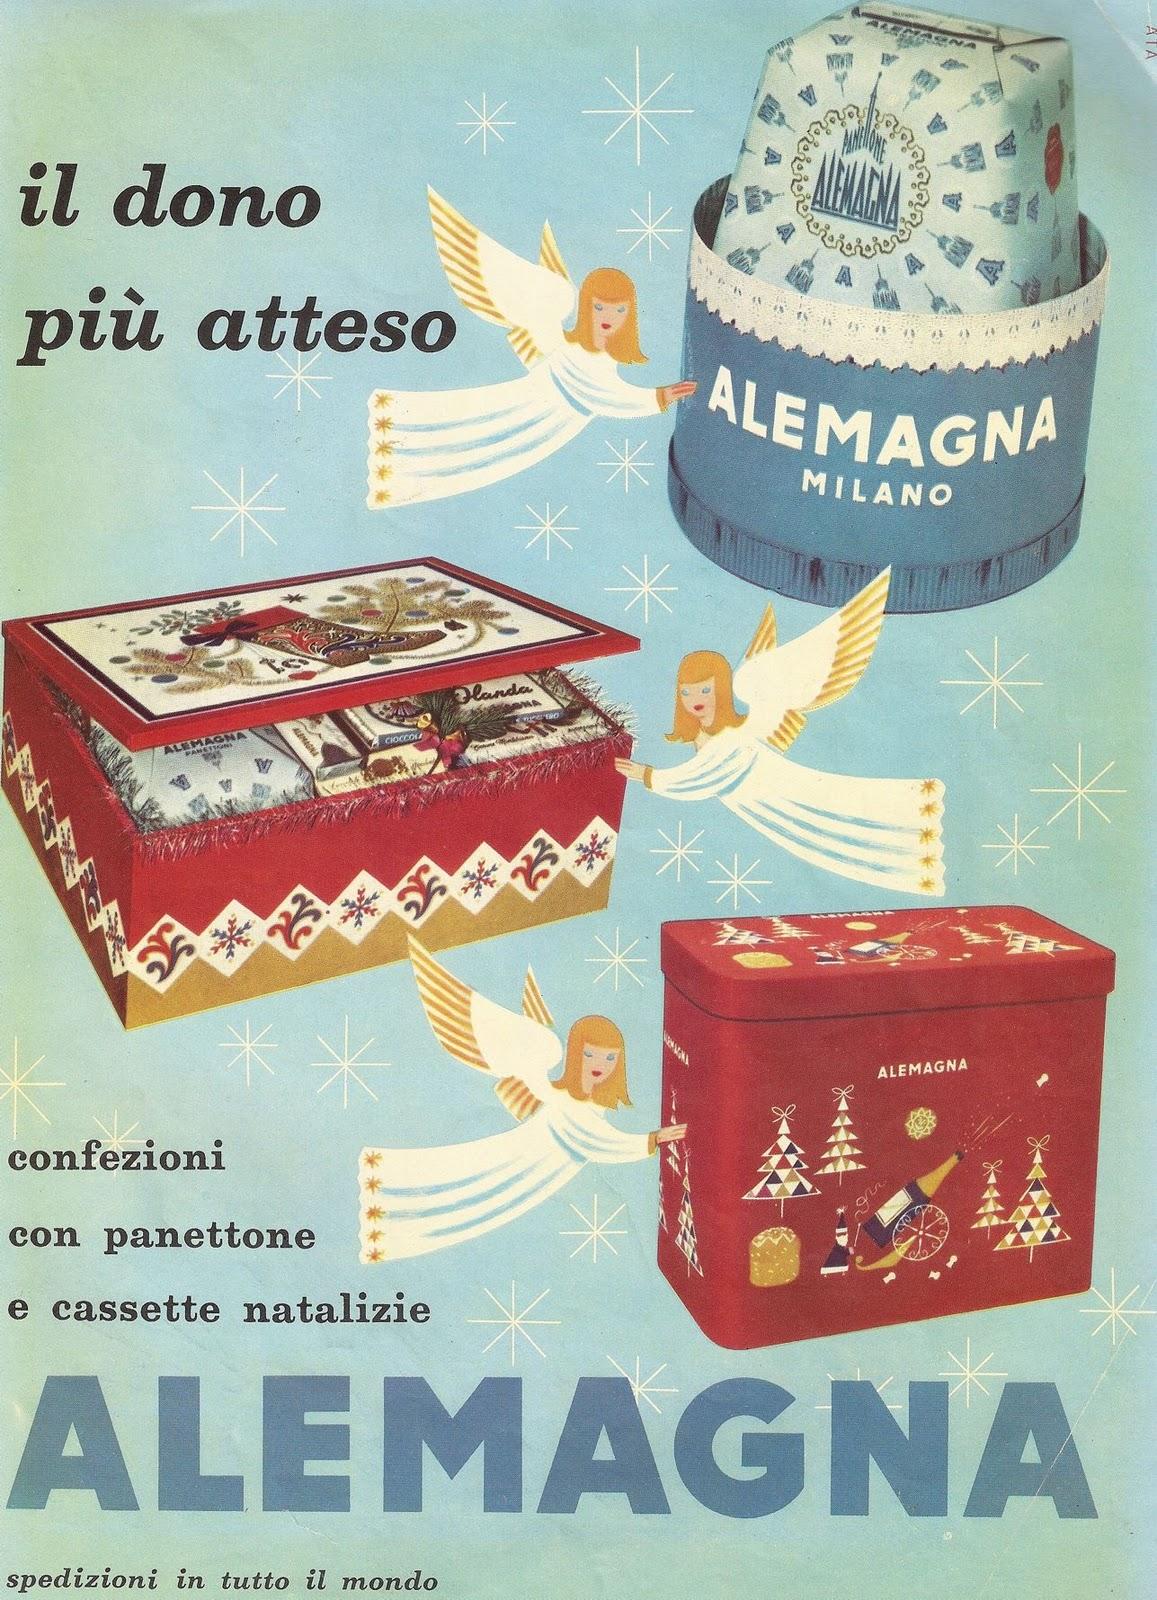 alemagna 1958 (bruno tredicine-napoli)